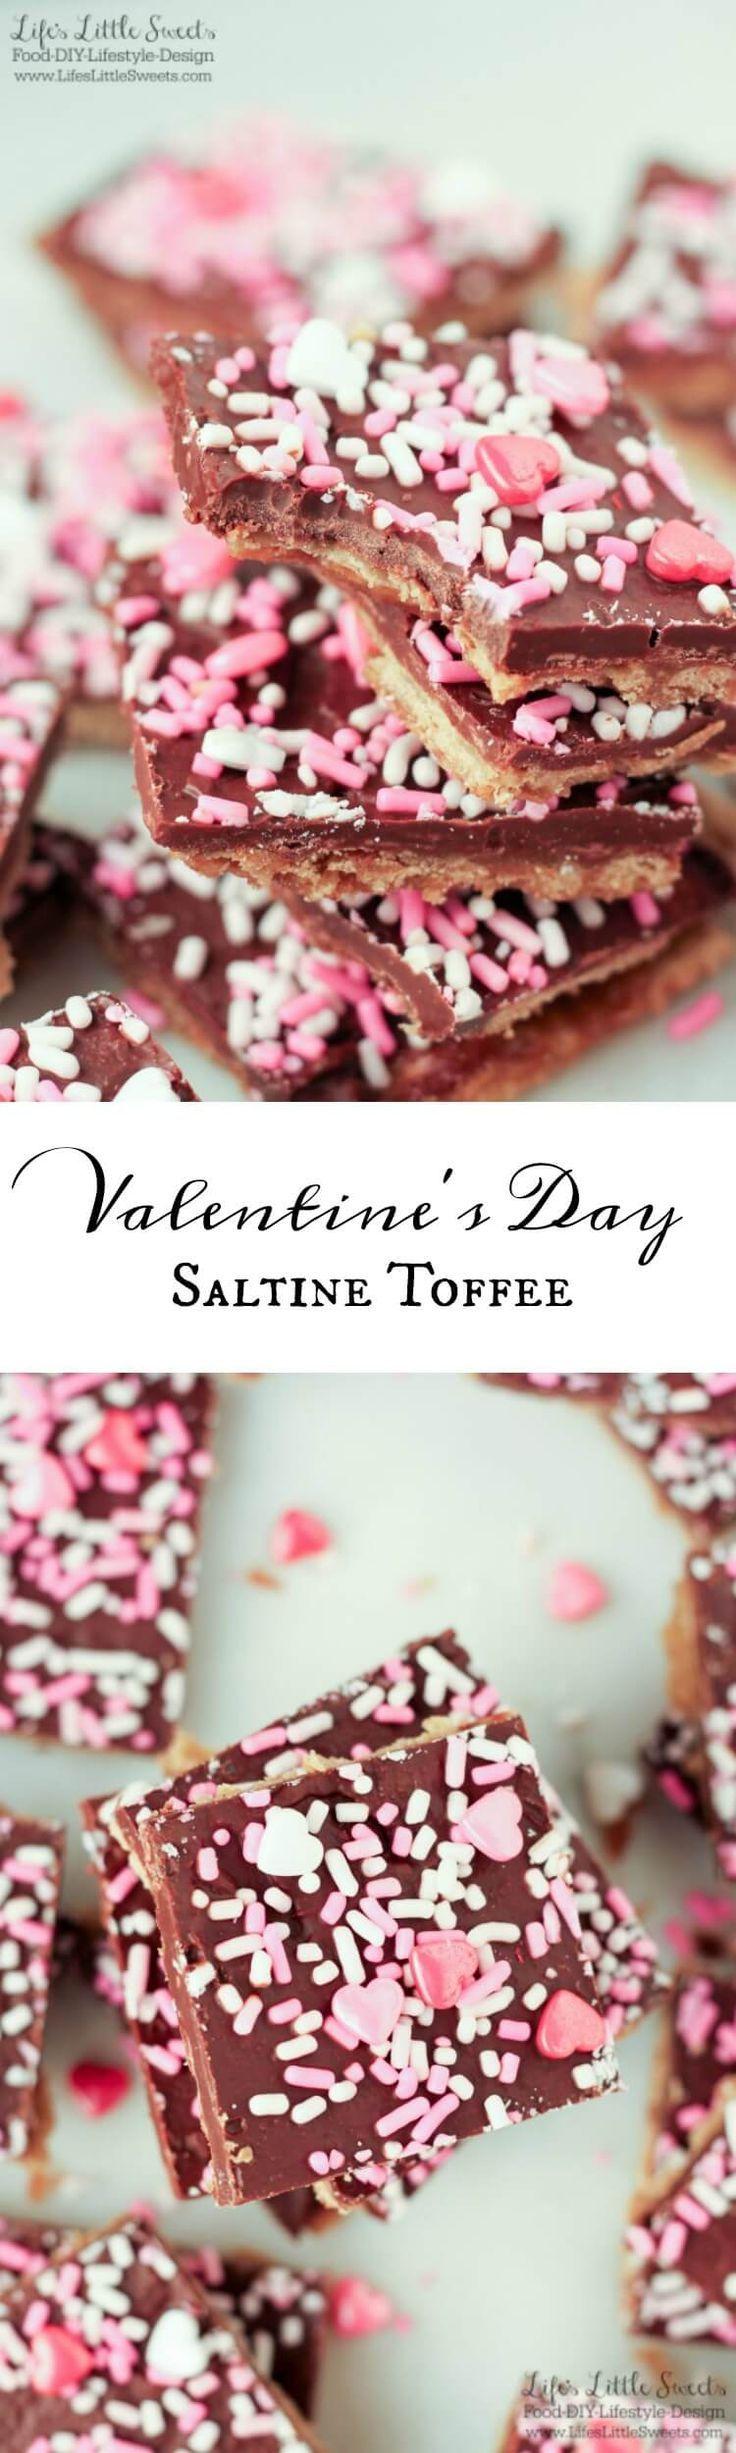 Photo of Valentine's Day Saltine Toffee